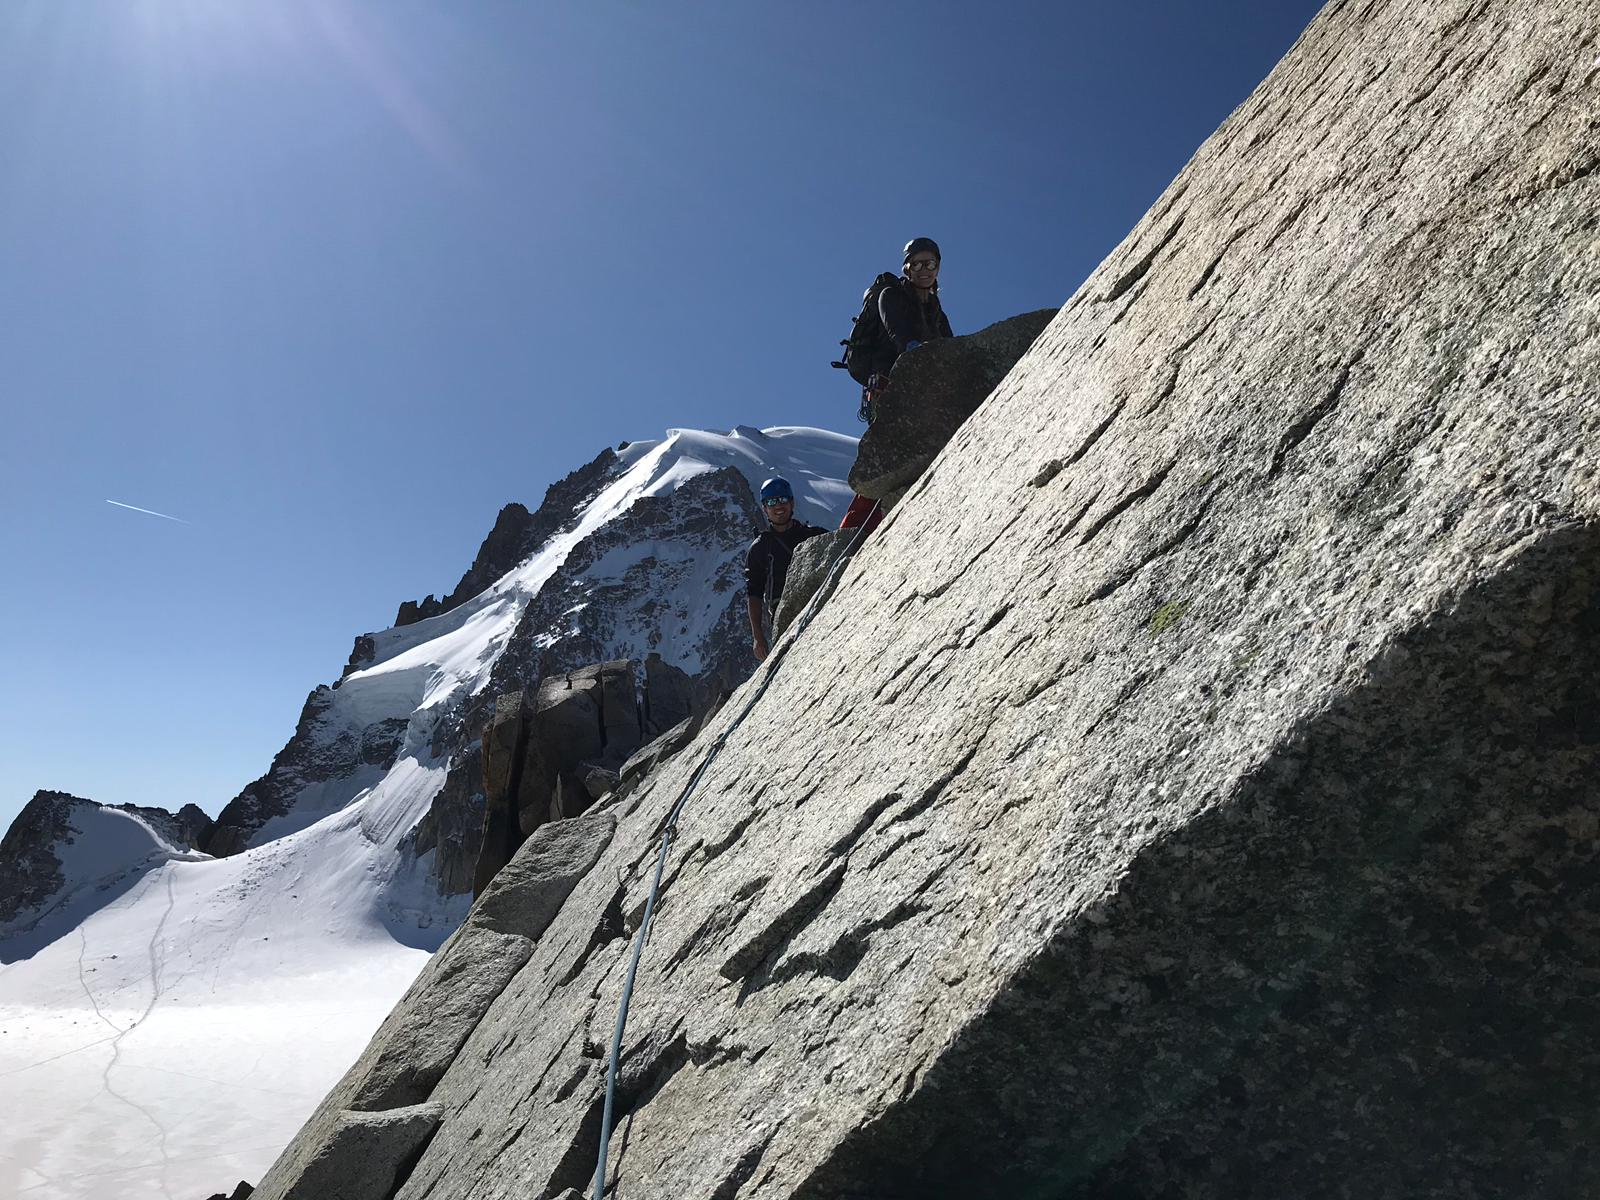 Chamonix Glacier Travel & Mountaineering Training Day